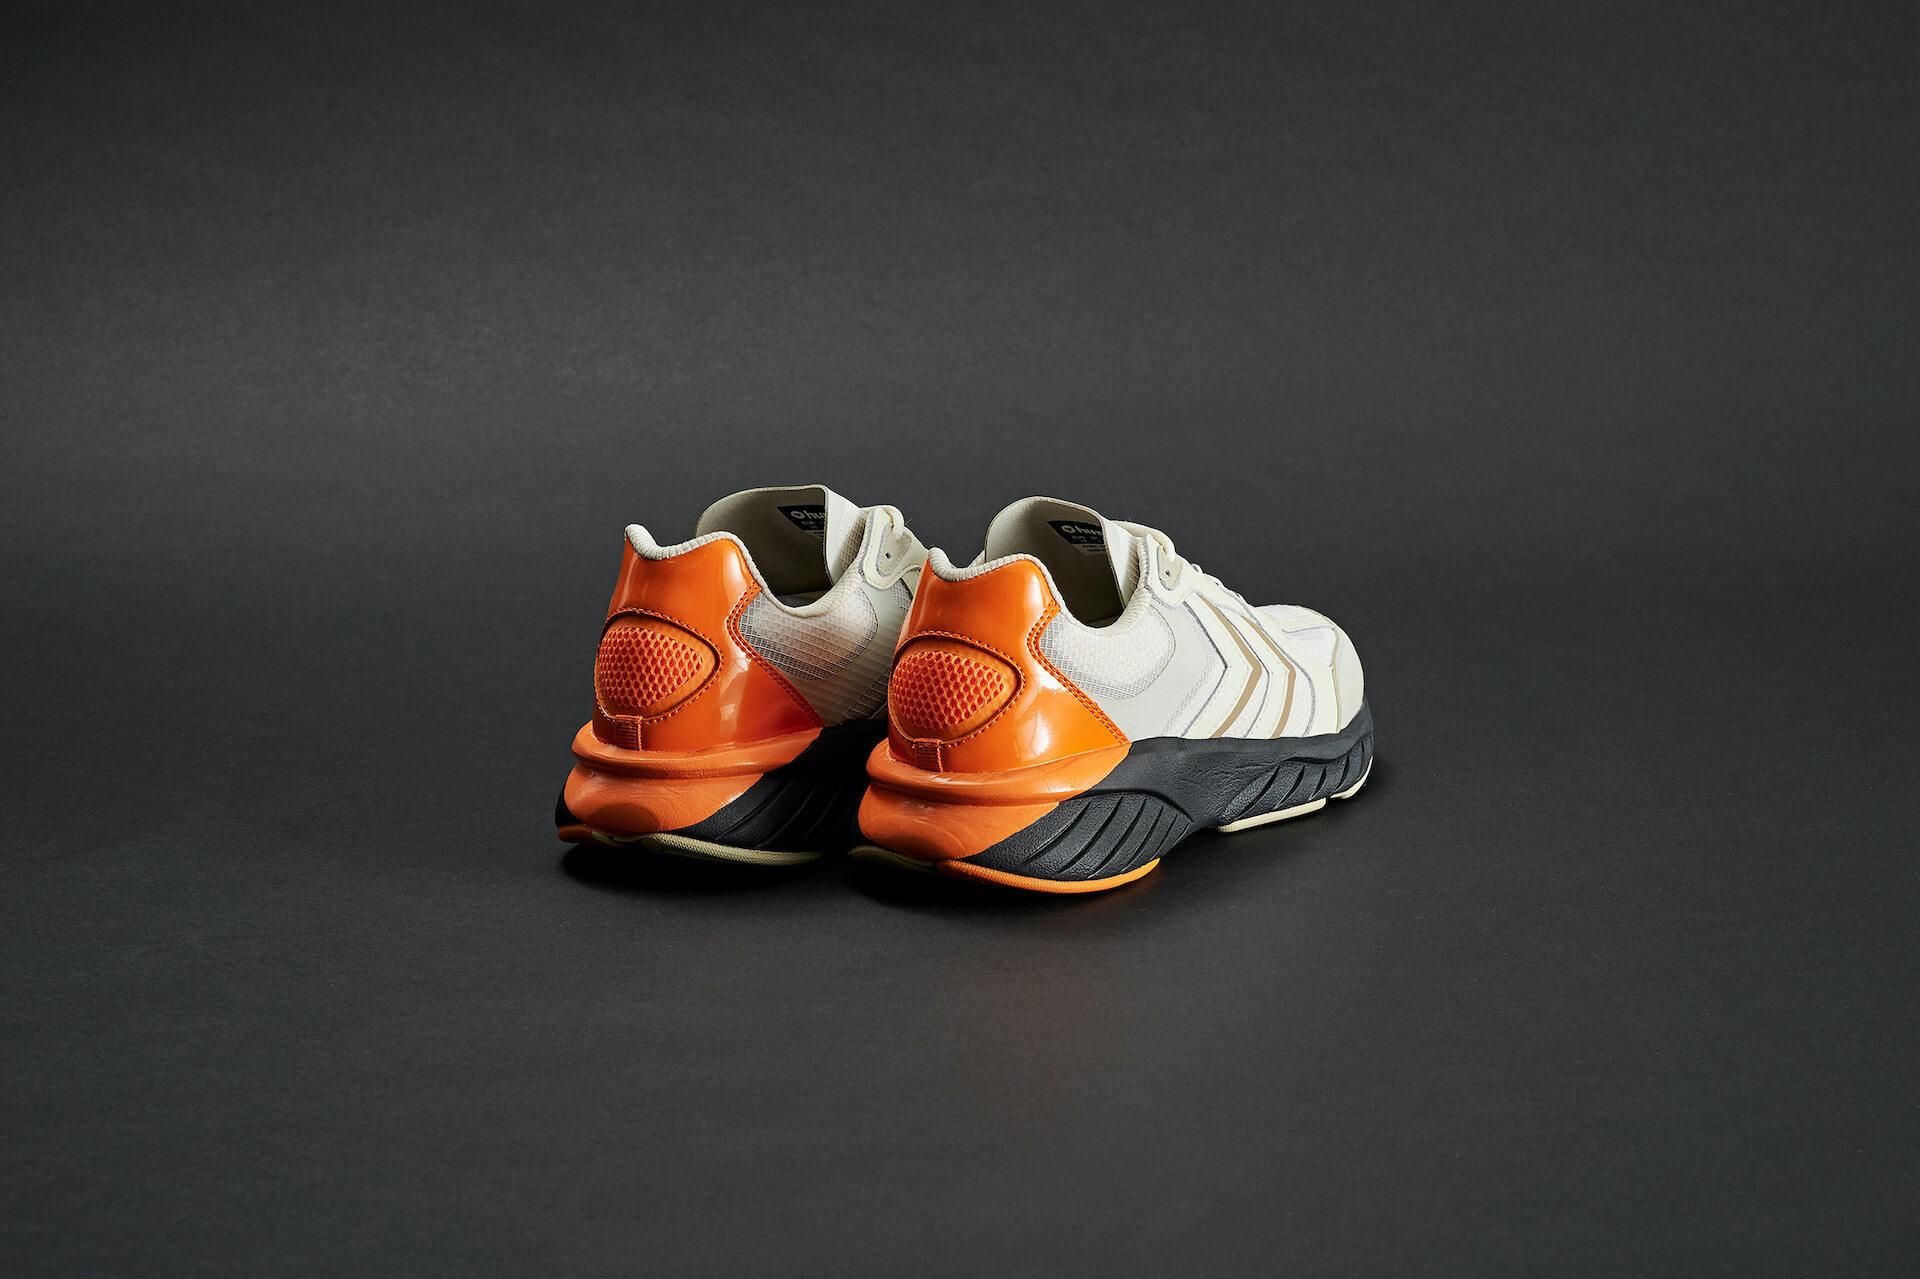 HUMMEL HIVEとASTRID ANDERSENのコラボスニーカーが東京・上野のmita sneakers限定で発売! lf200819_hummelhive_astritandersen_05